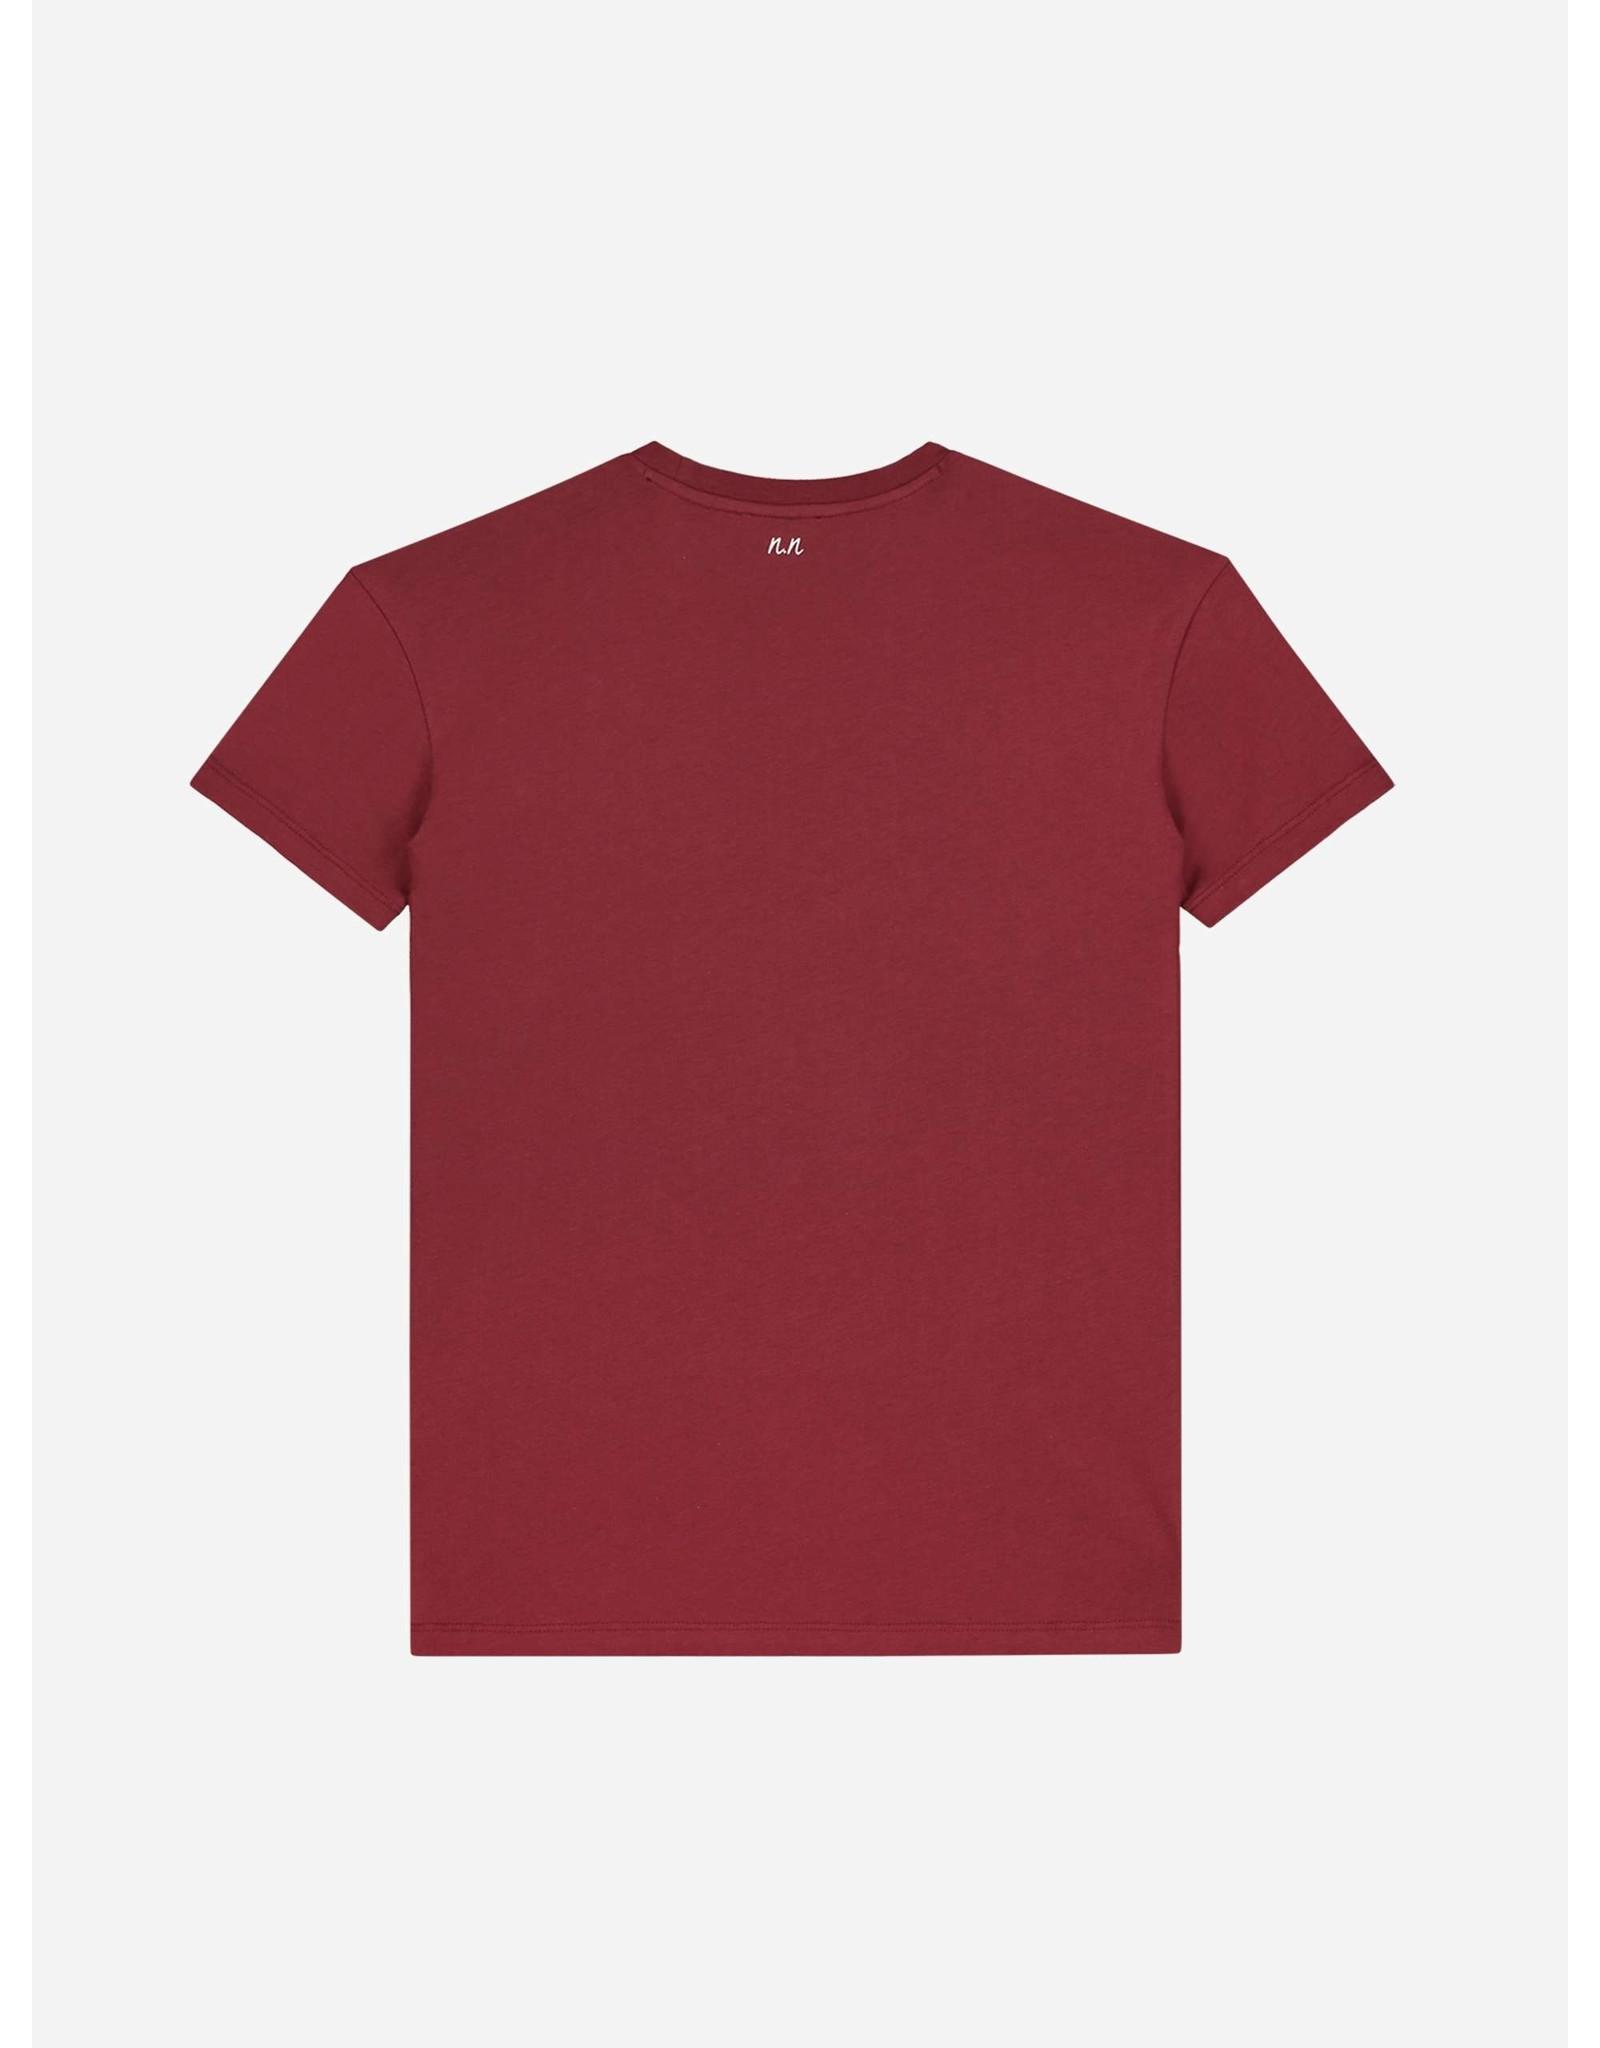 Nik&Nik NIK & NIK Lutz T-shirt Mid Red